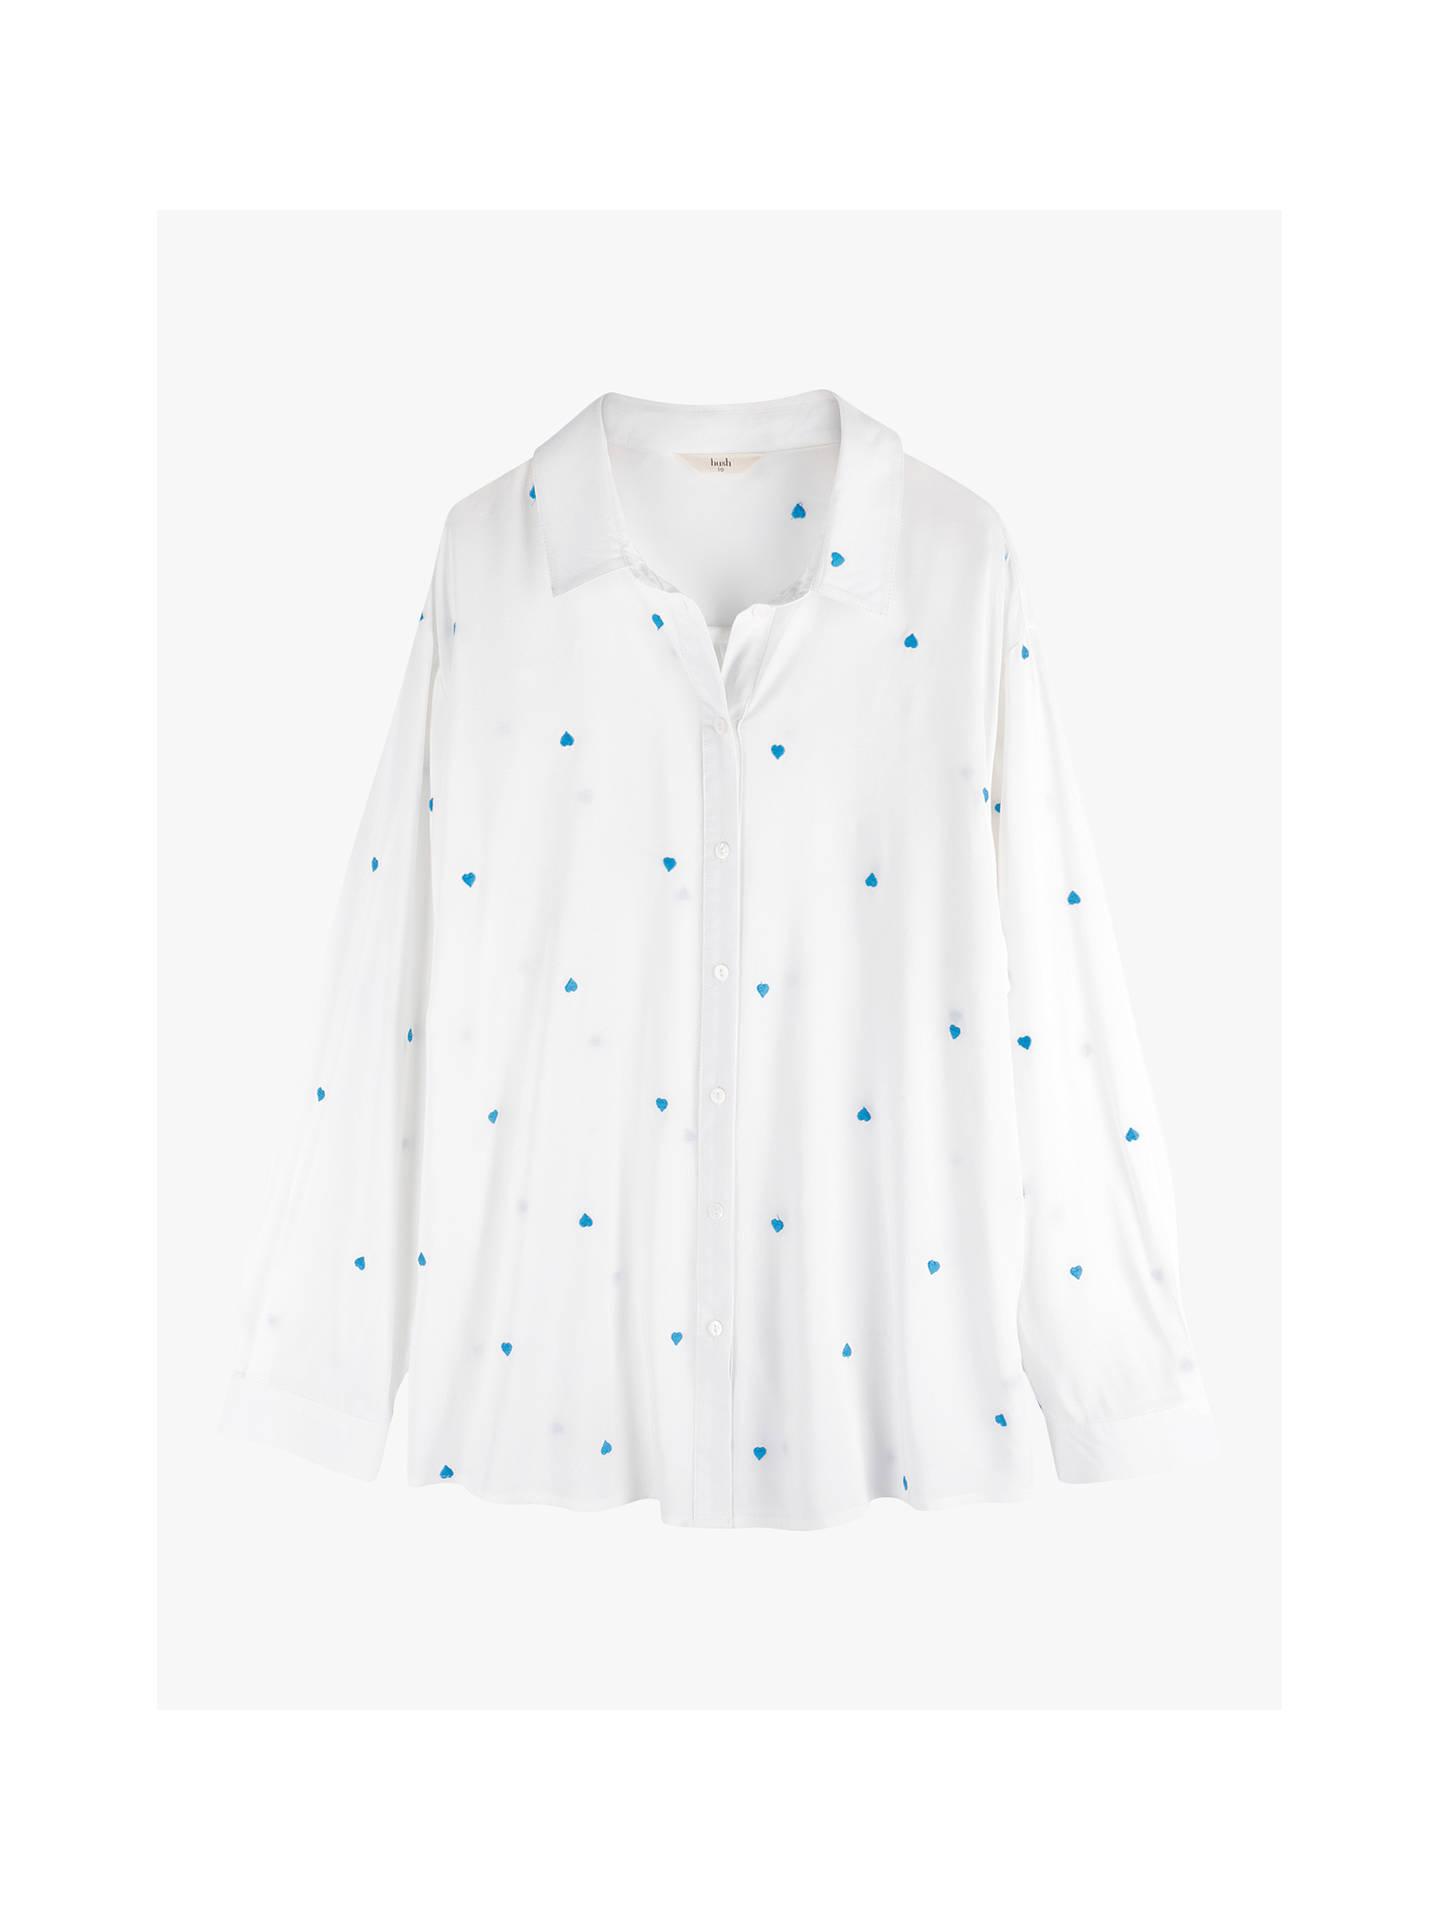 Hush Yael Heart Embroidered Shirt, White/Mykonos Blue by Hush